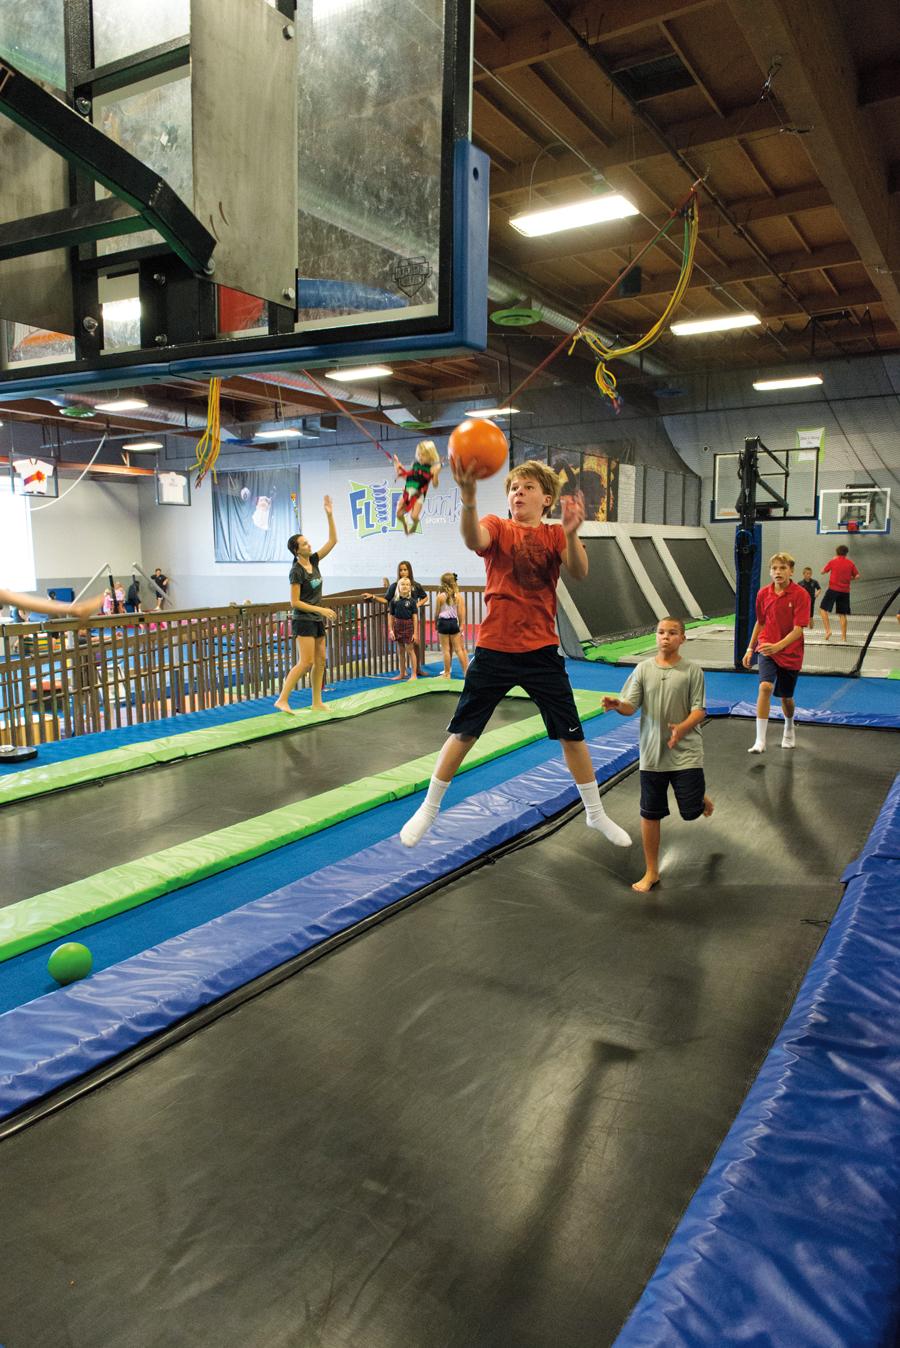 Kids having fun at Flip Dunk Sports. Photo by Dan Friedman.